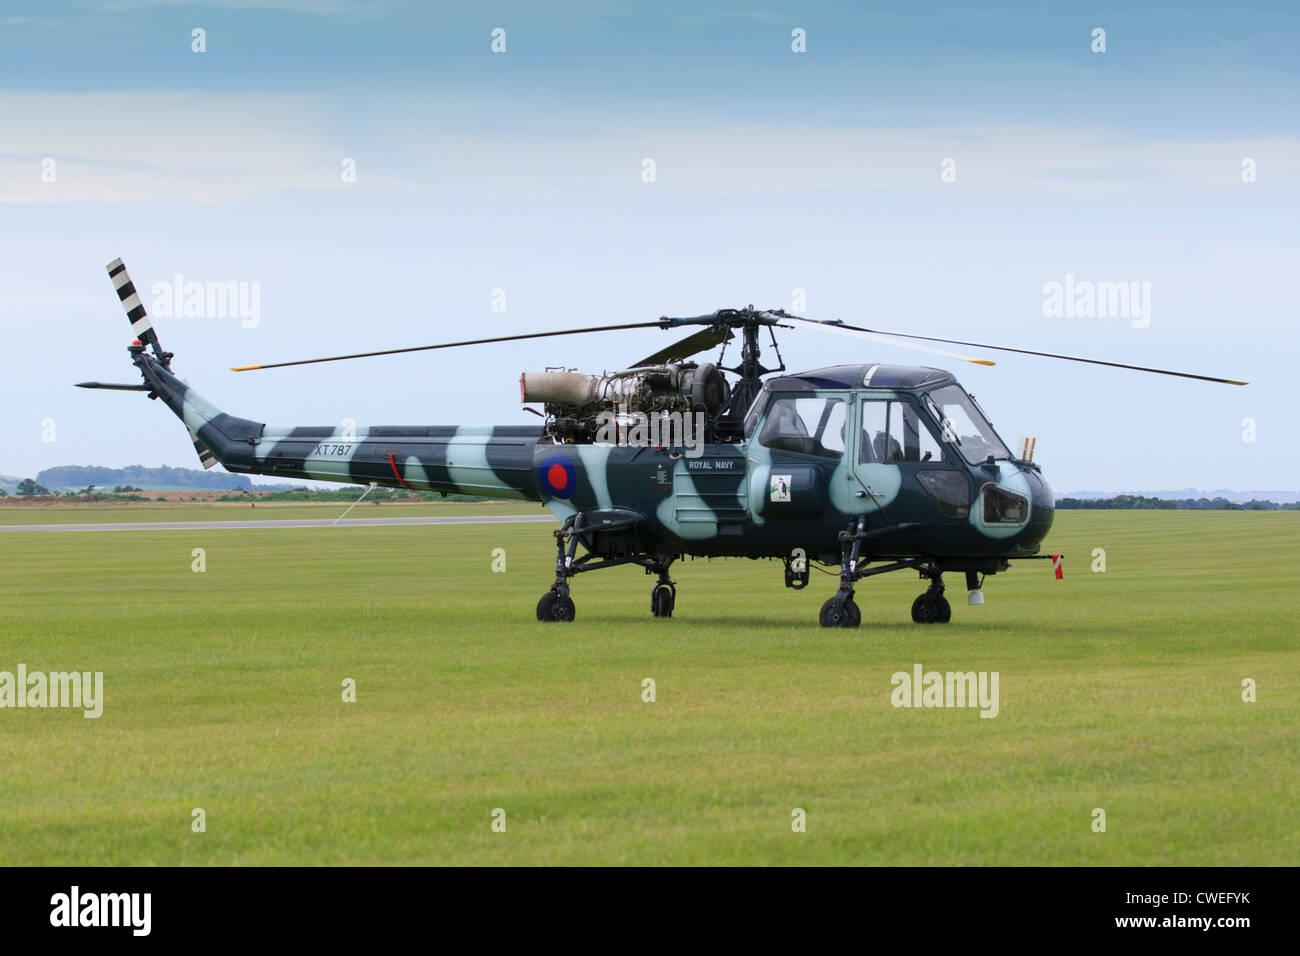 Westland Wasp helicopter at Duxford aerodrome - Stock Image